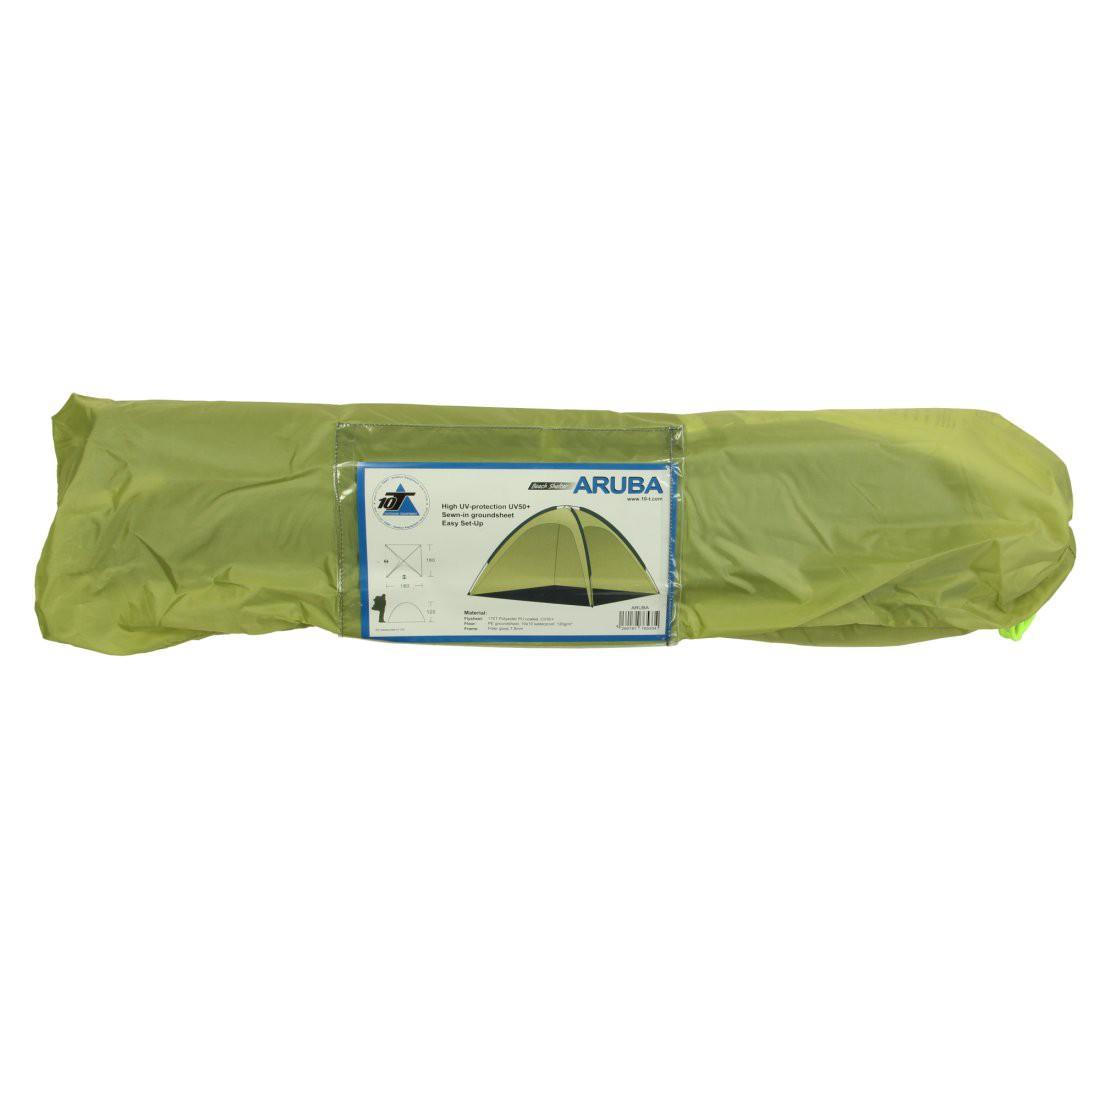 Aruba XL UV 50 Strandmuschel Strandzelt 180x180x120cm Windschutz Sonnenschutz